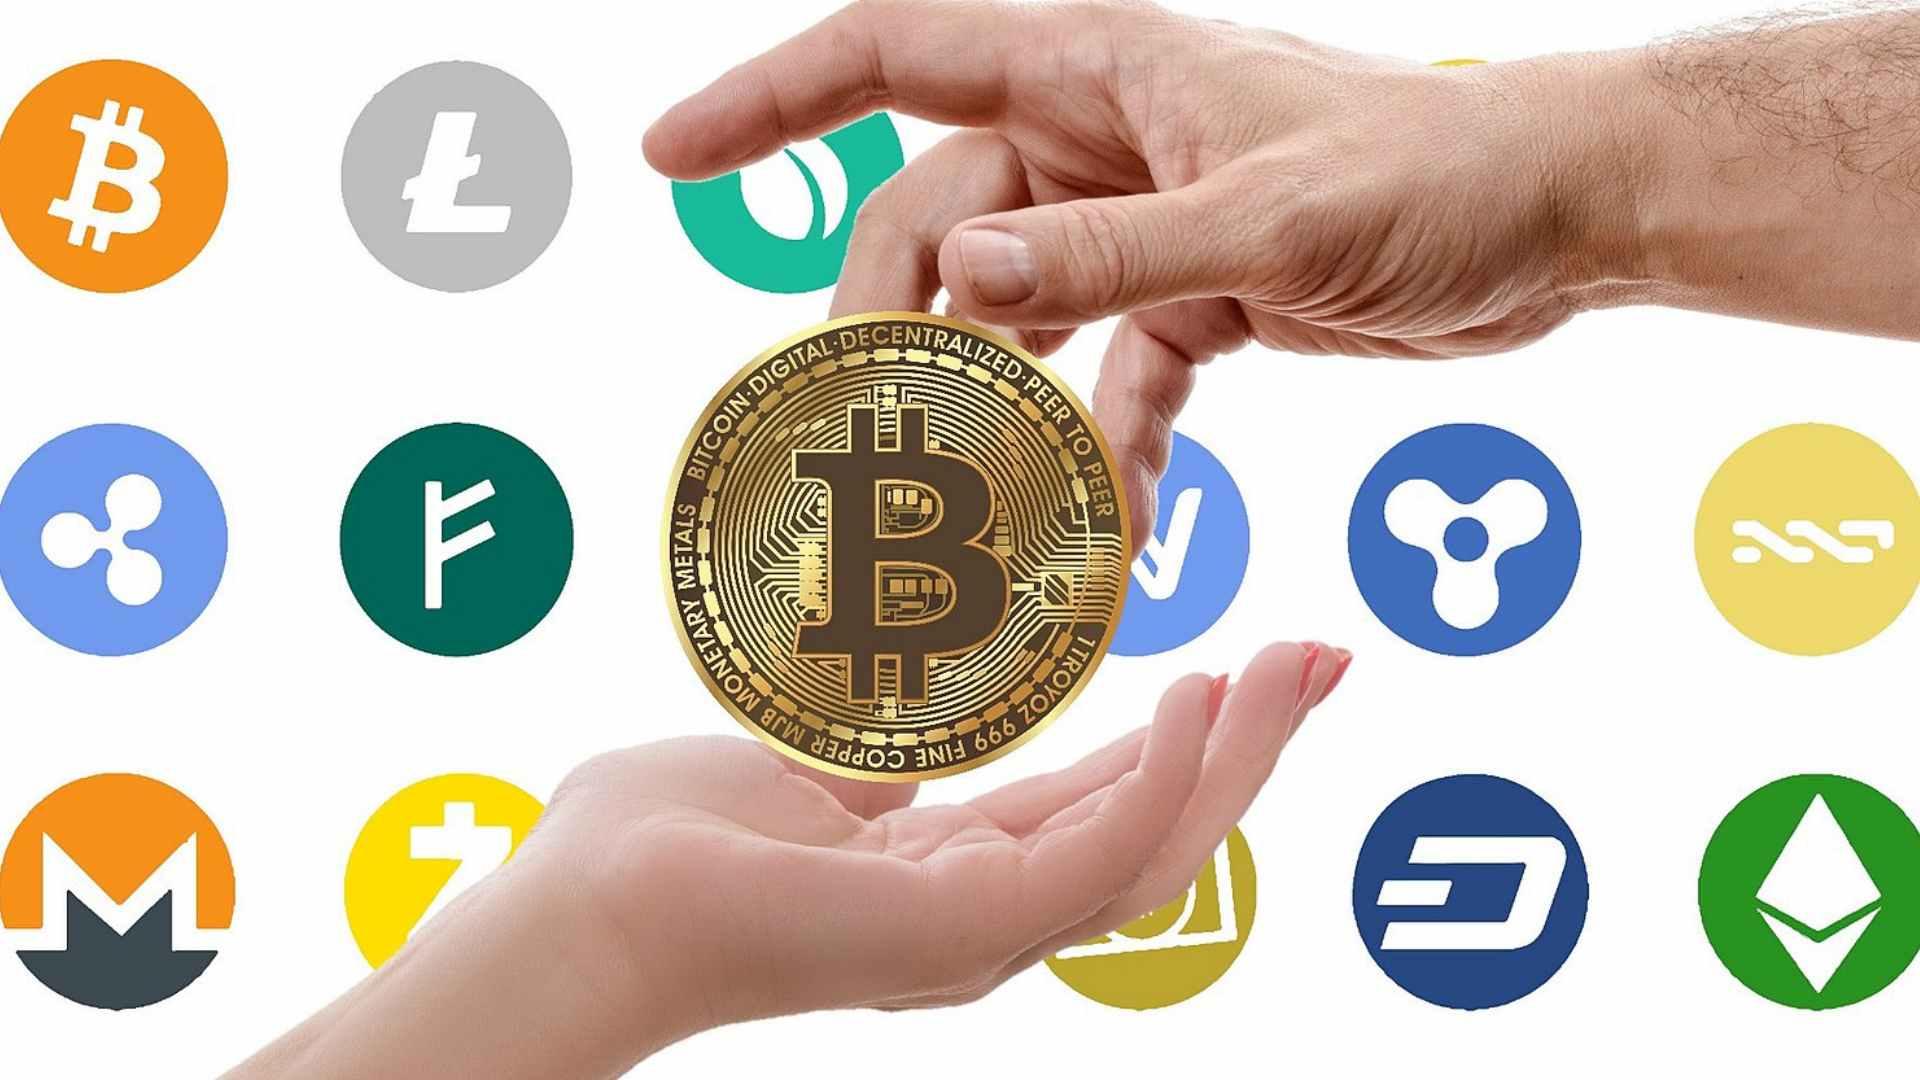 kripotvalutak cryptocurrency